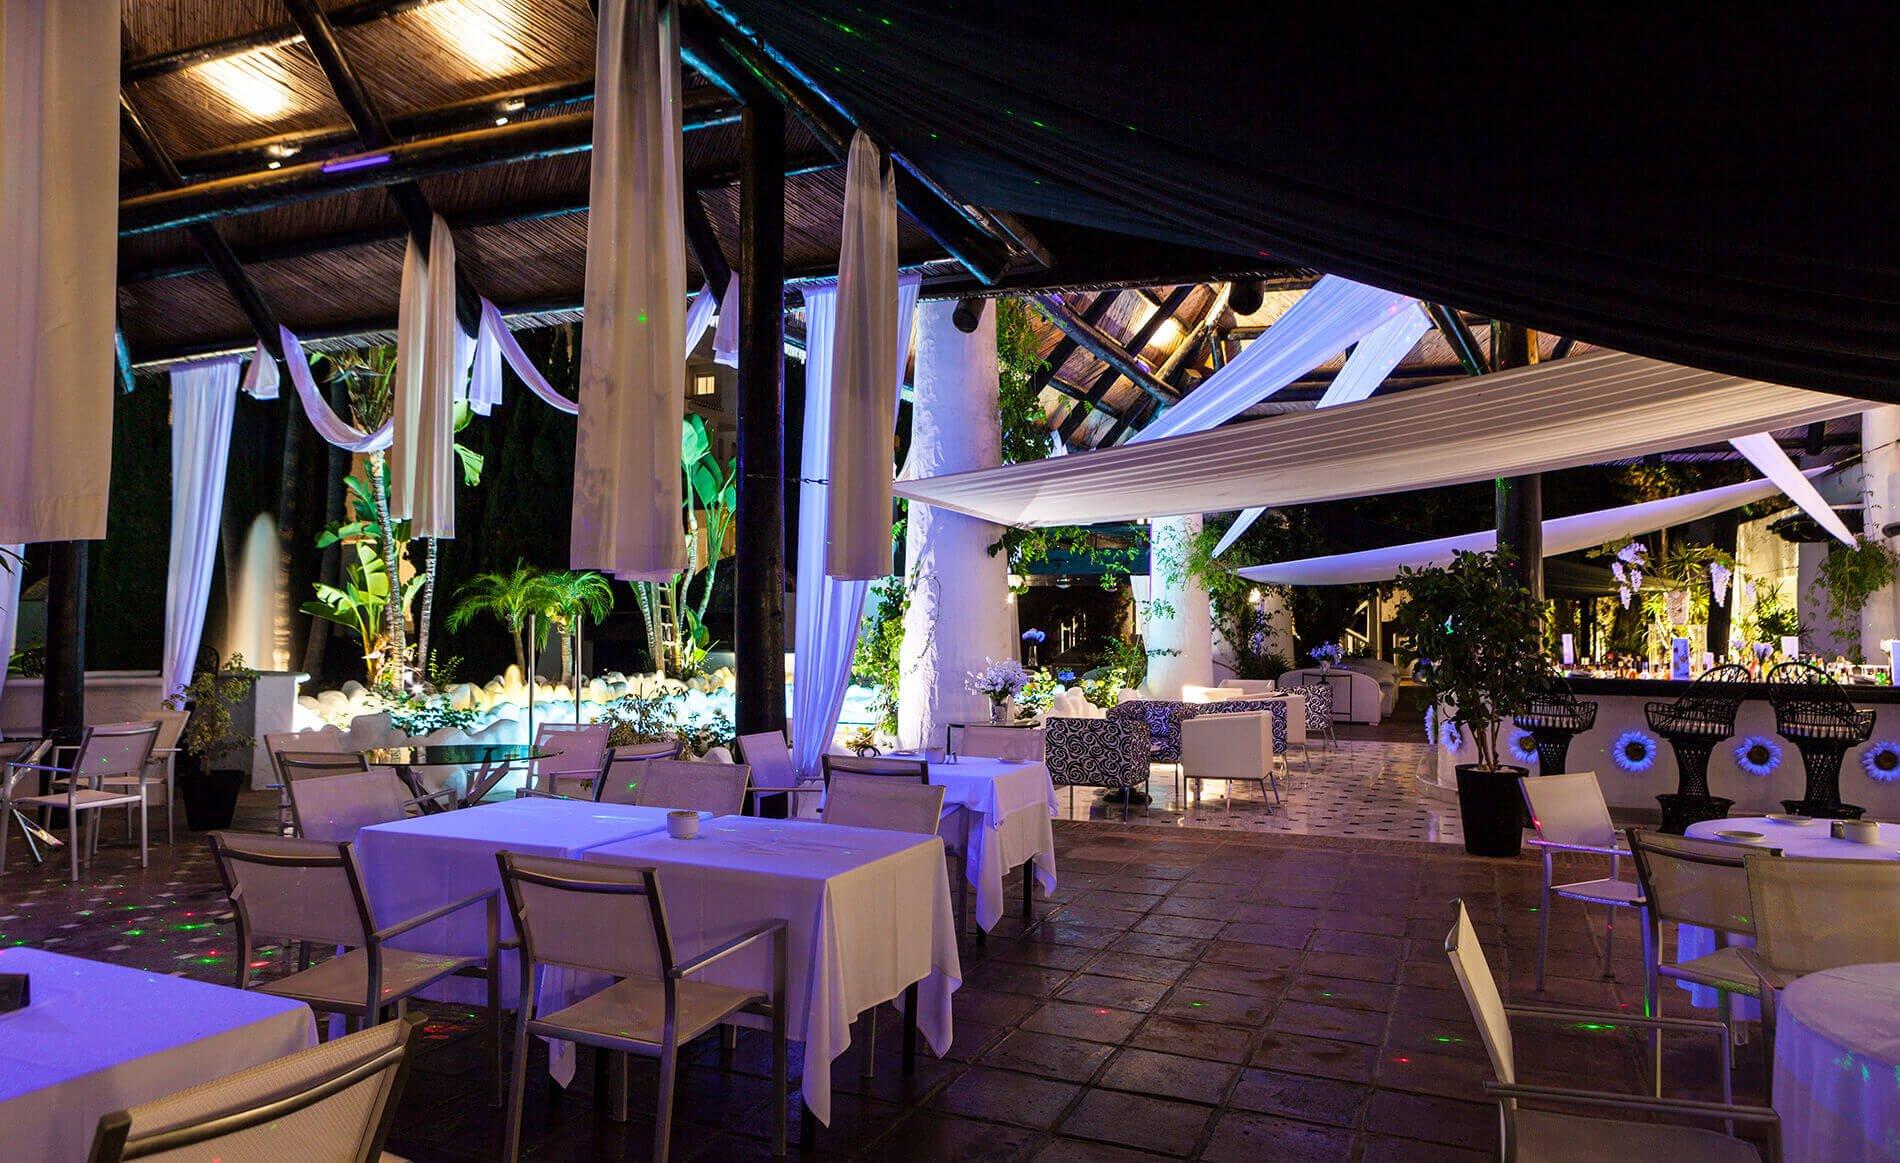 Espanja-Almuneckar-Hotel Suite Albayzin del Mar iltaterassi